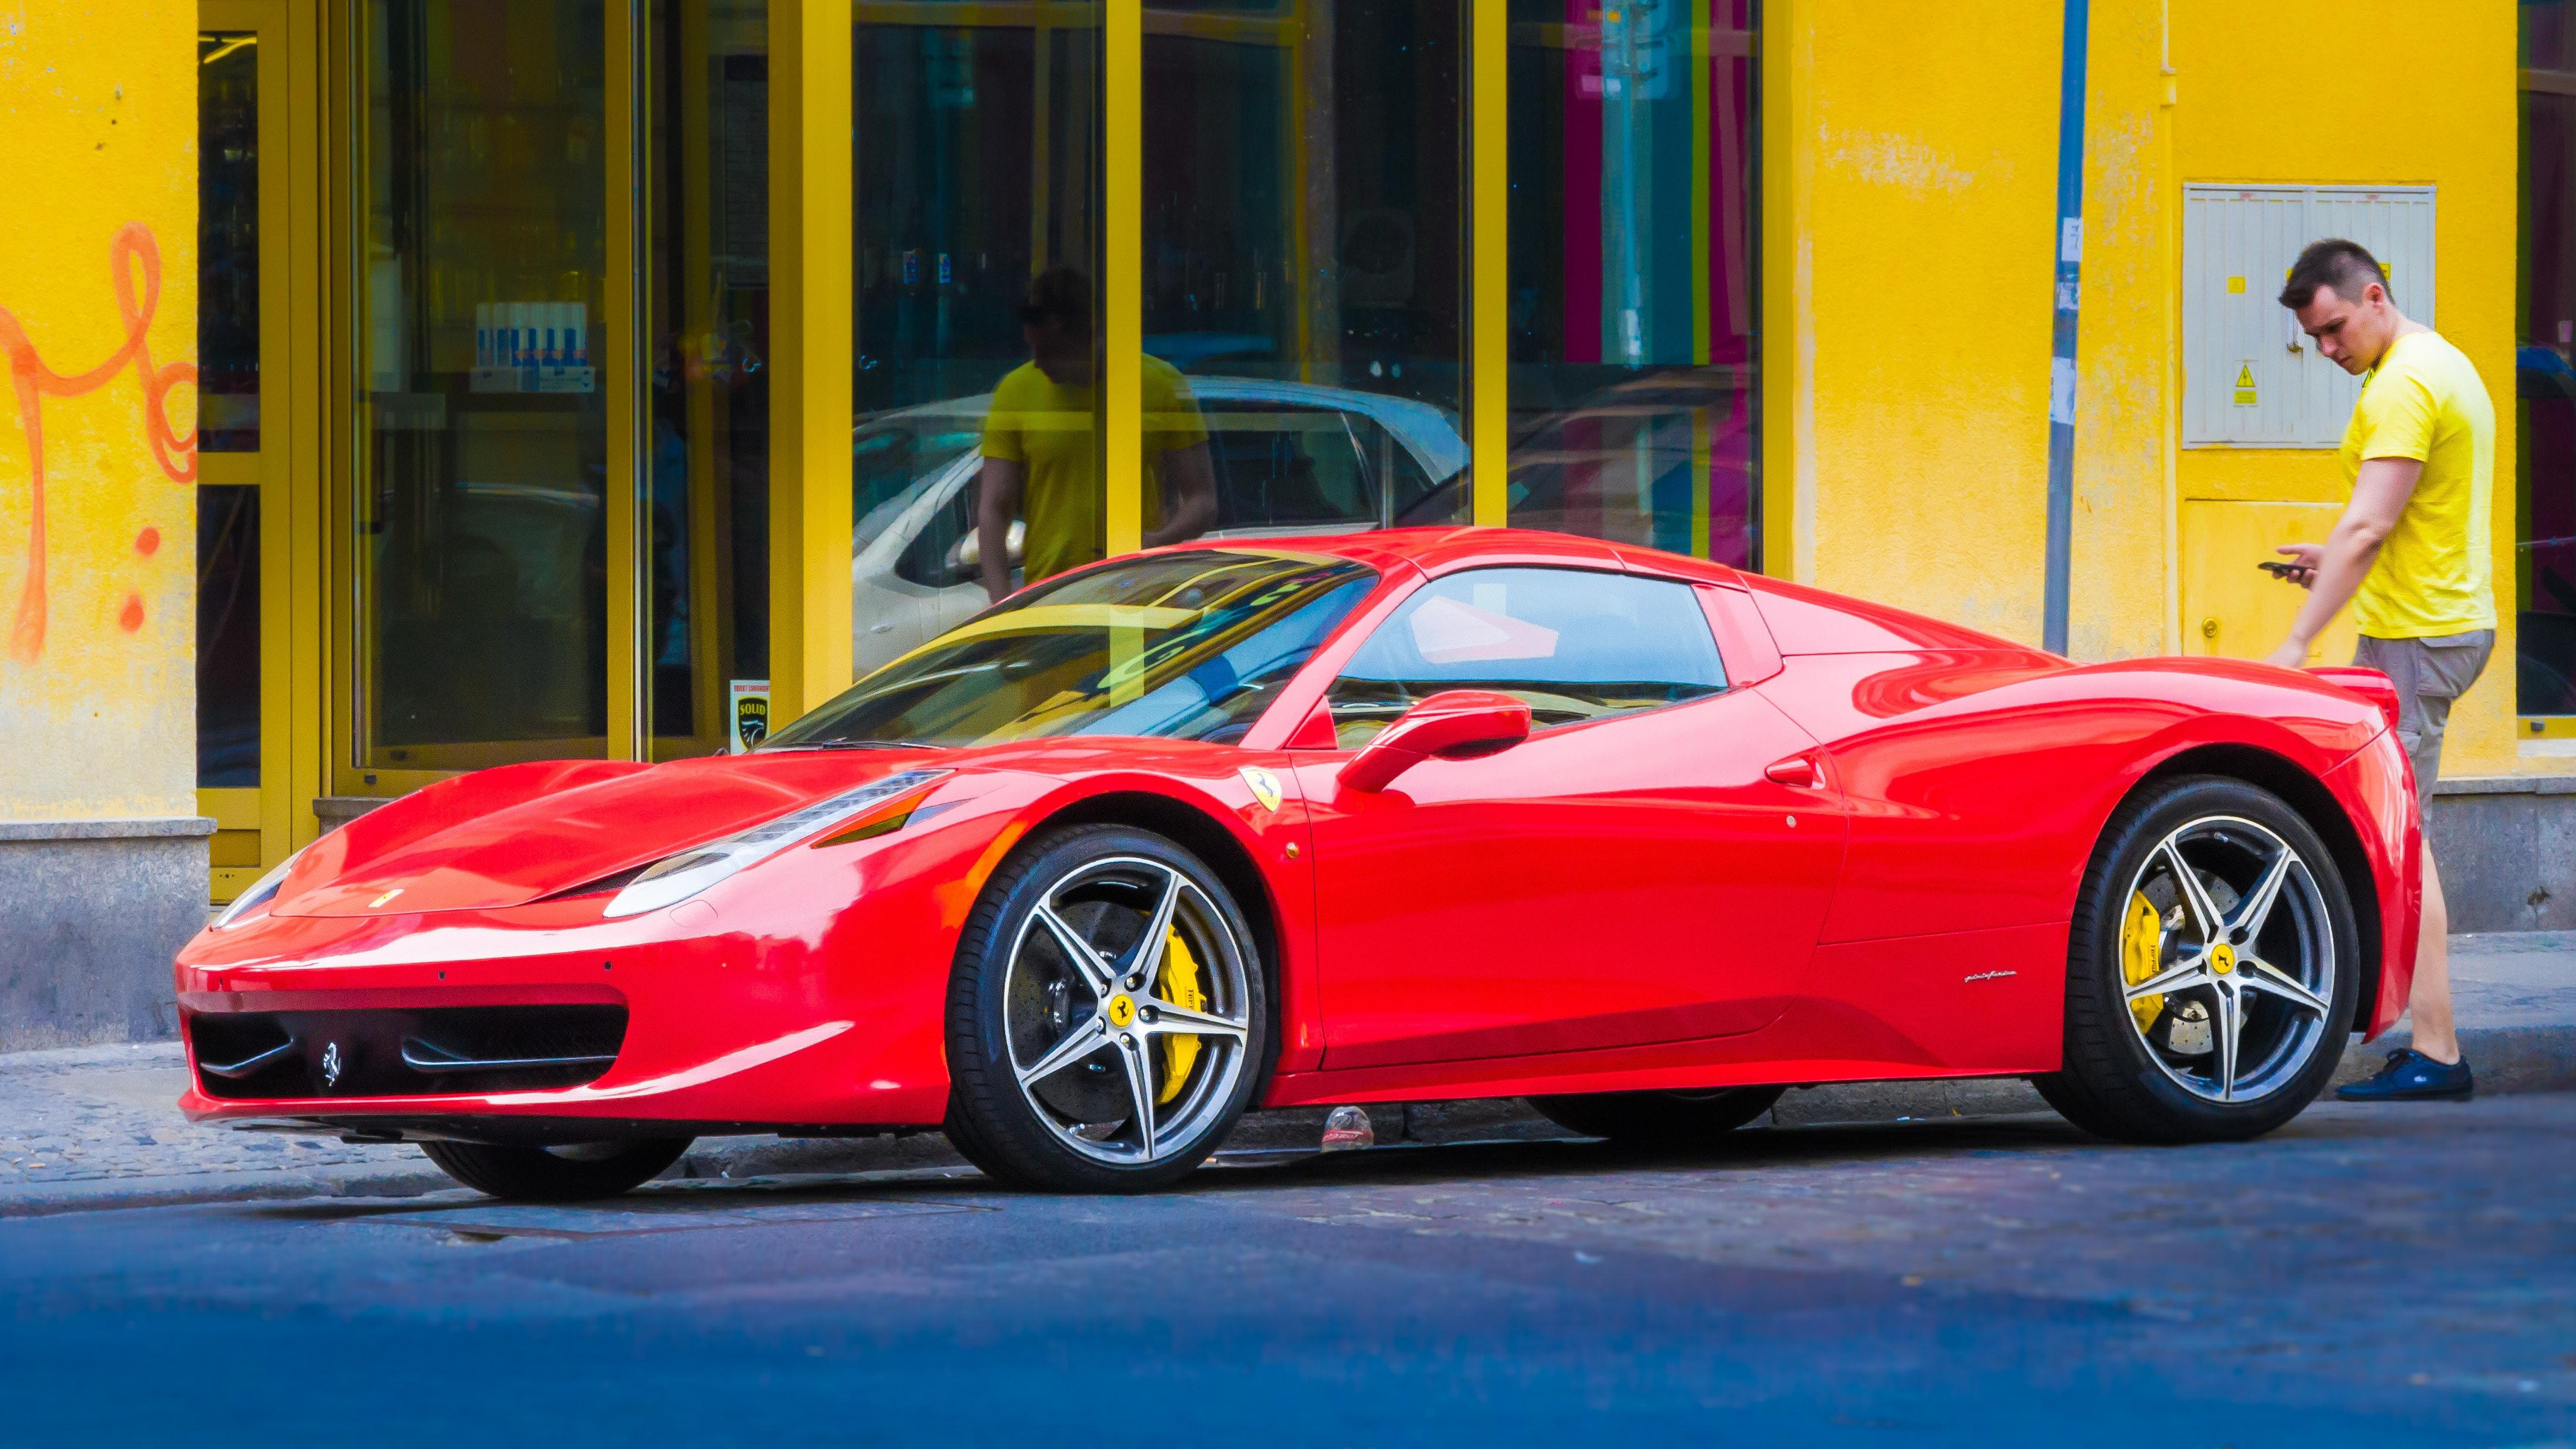 The Original Cash For Cars image 2